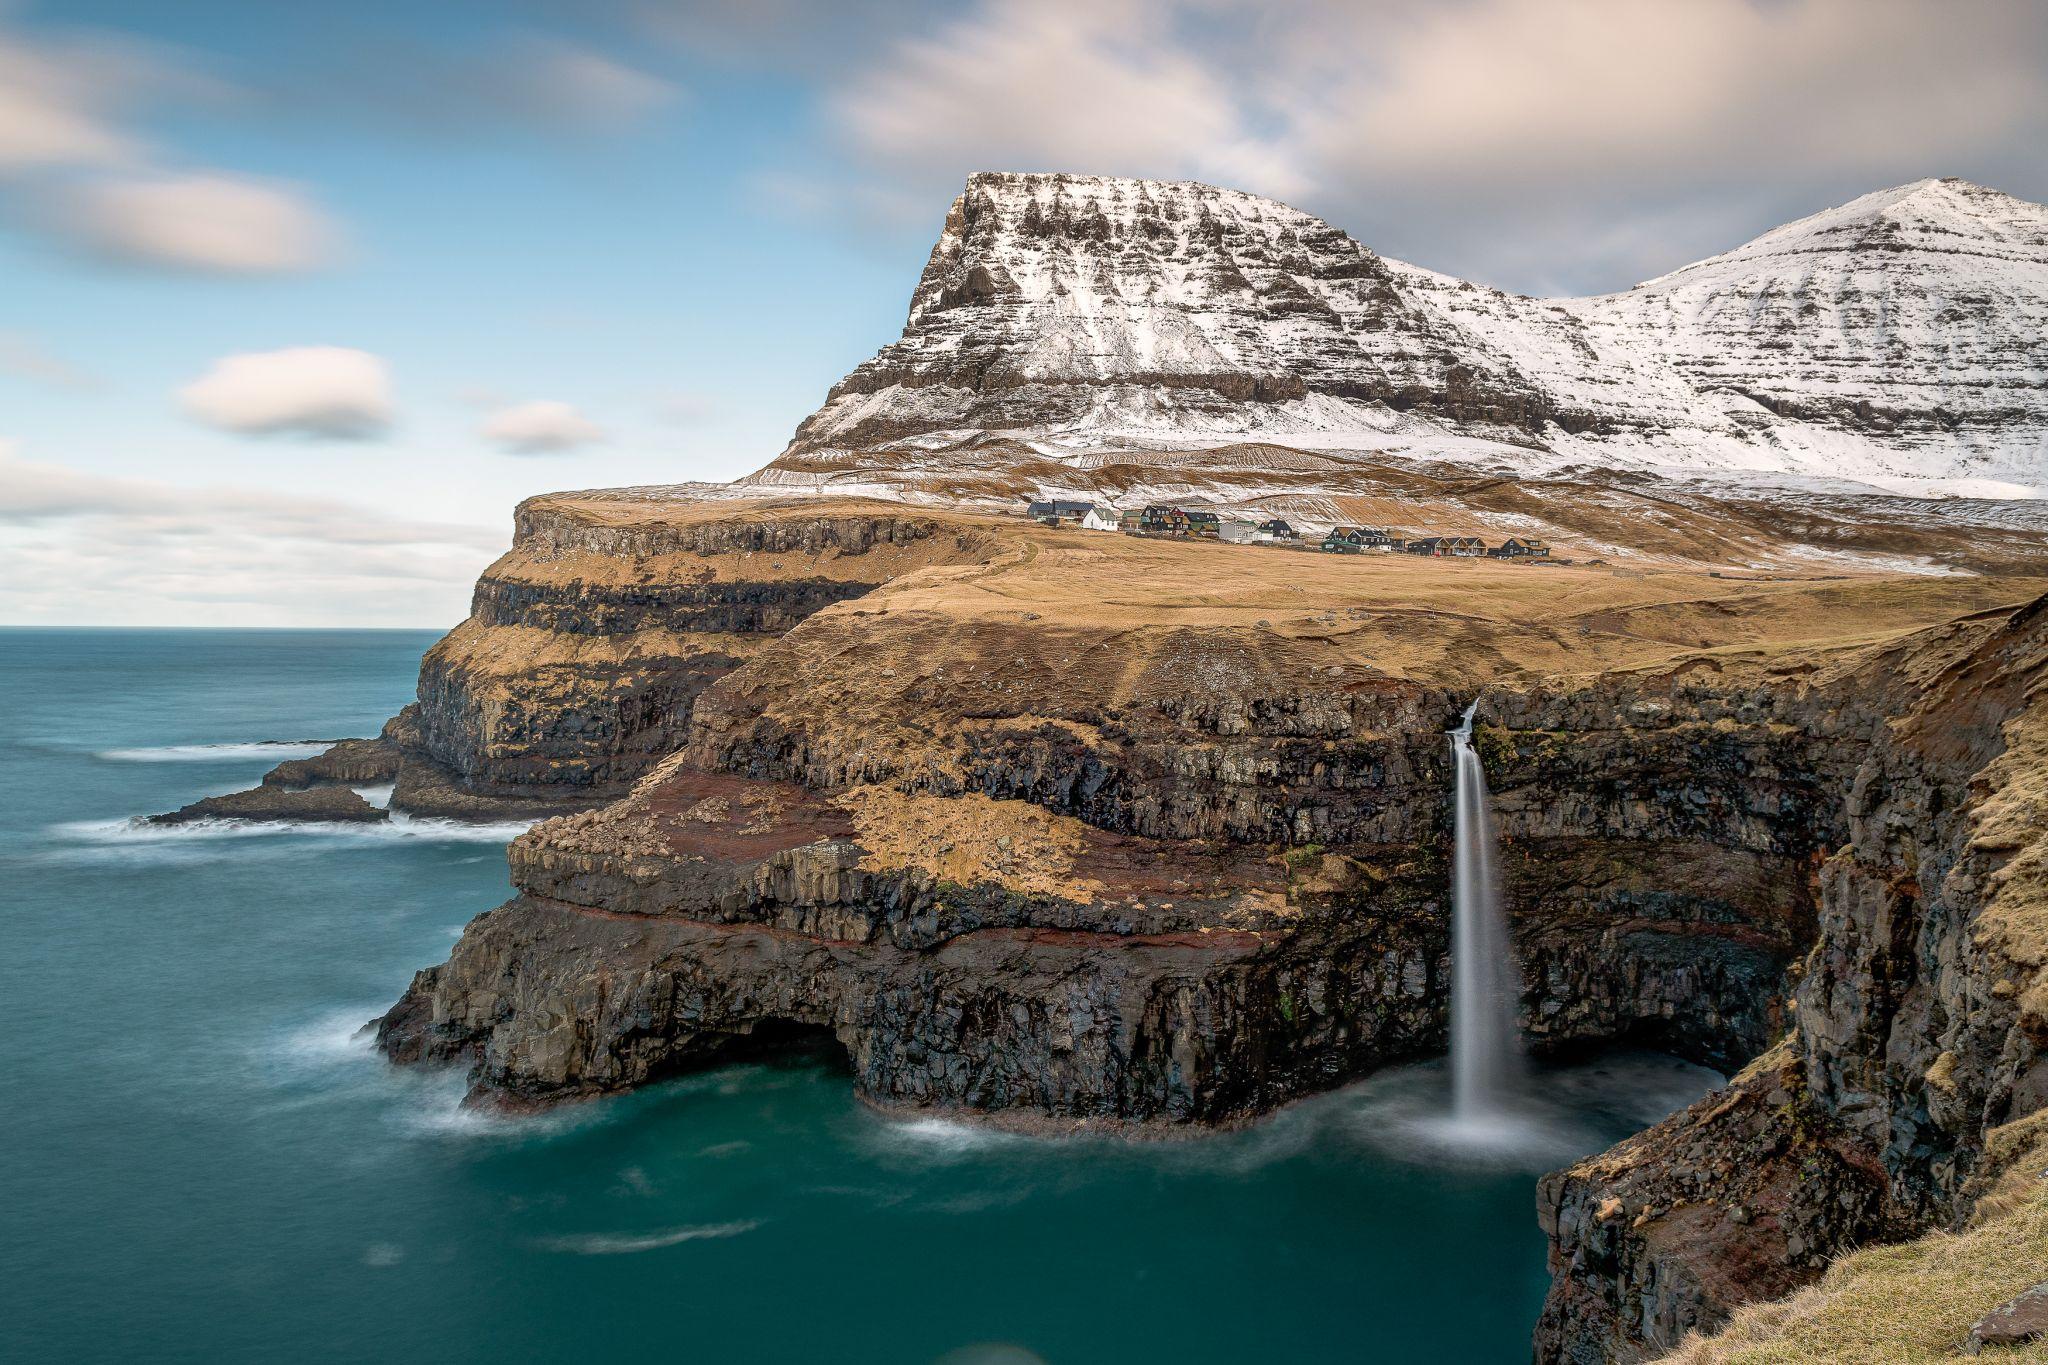 Gasadalur village and the Múlafossur waterfall, Faroe Islands